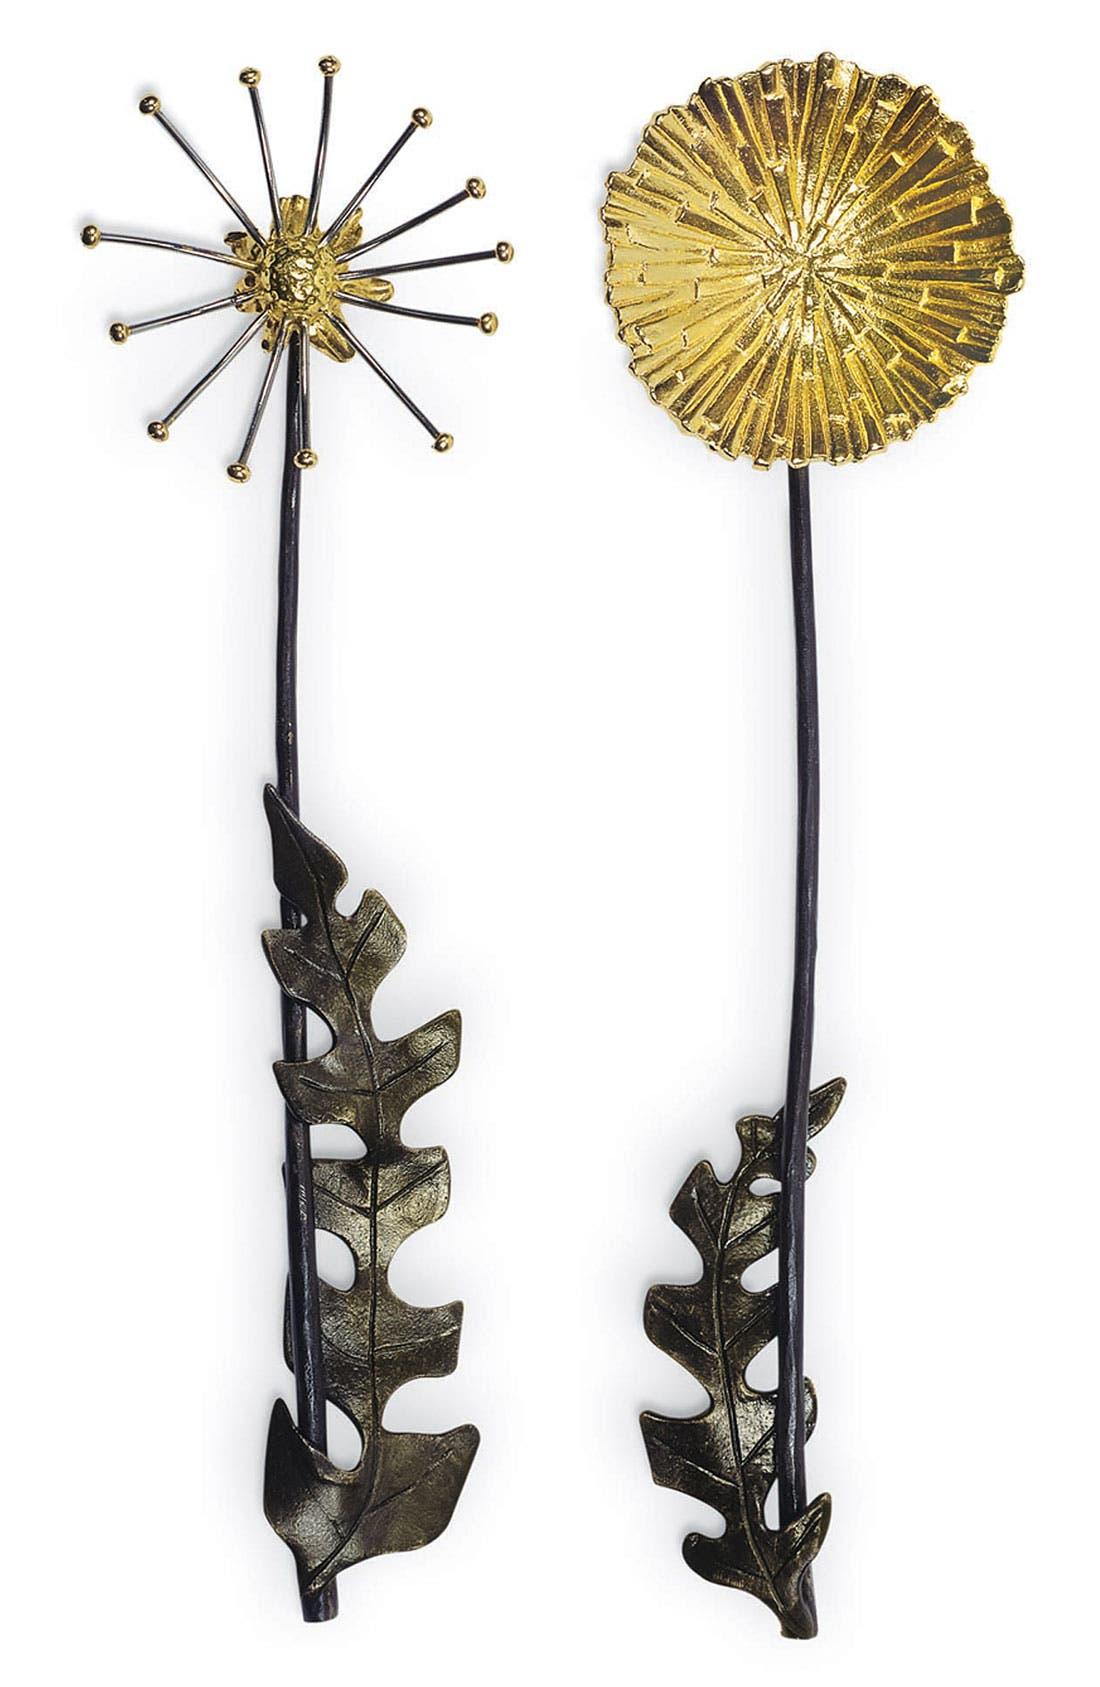 Alternate Image 1 Selected - Michael Aram 'Dandelion' Serving Set